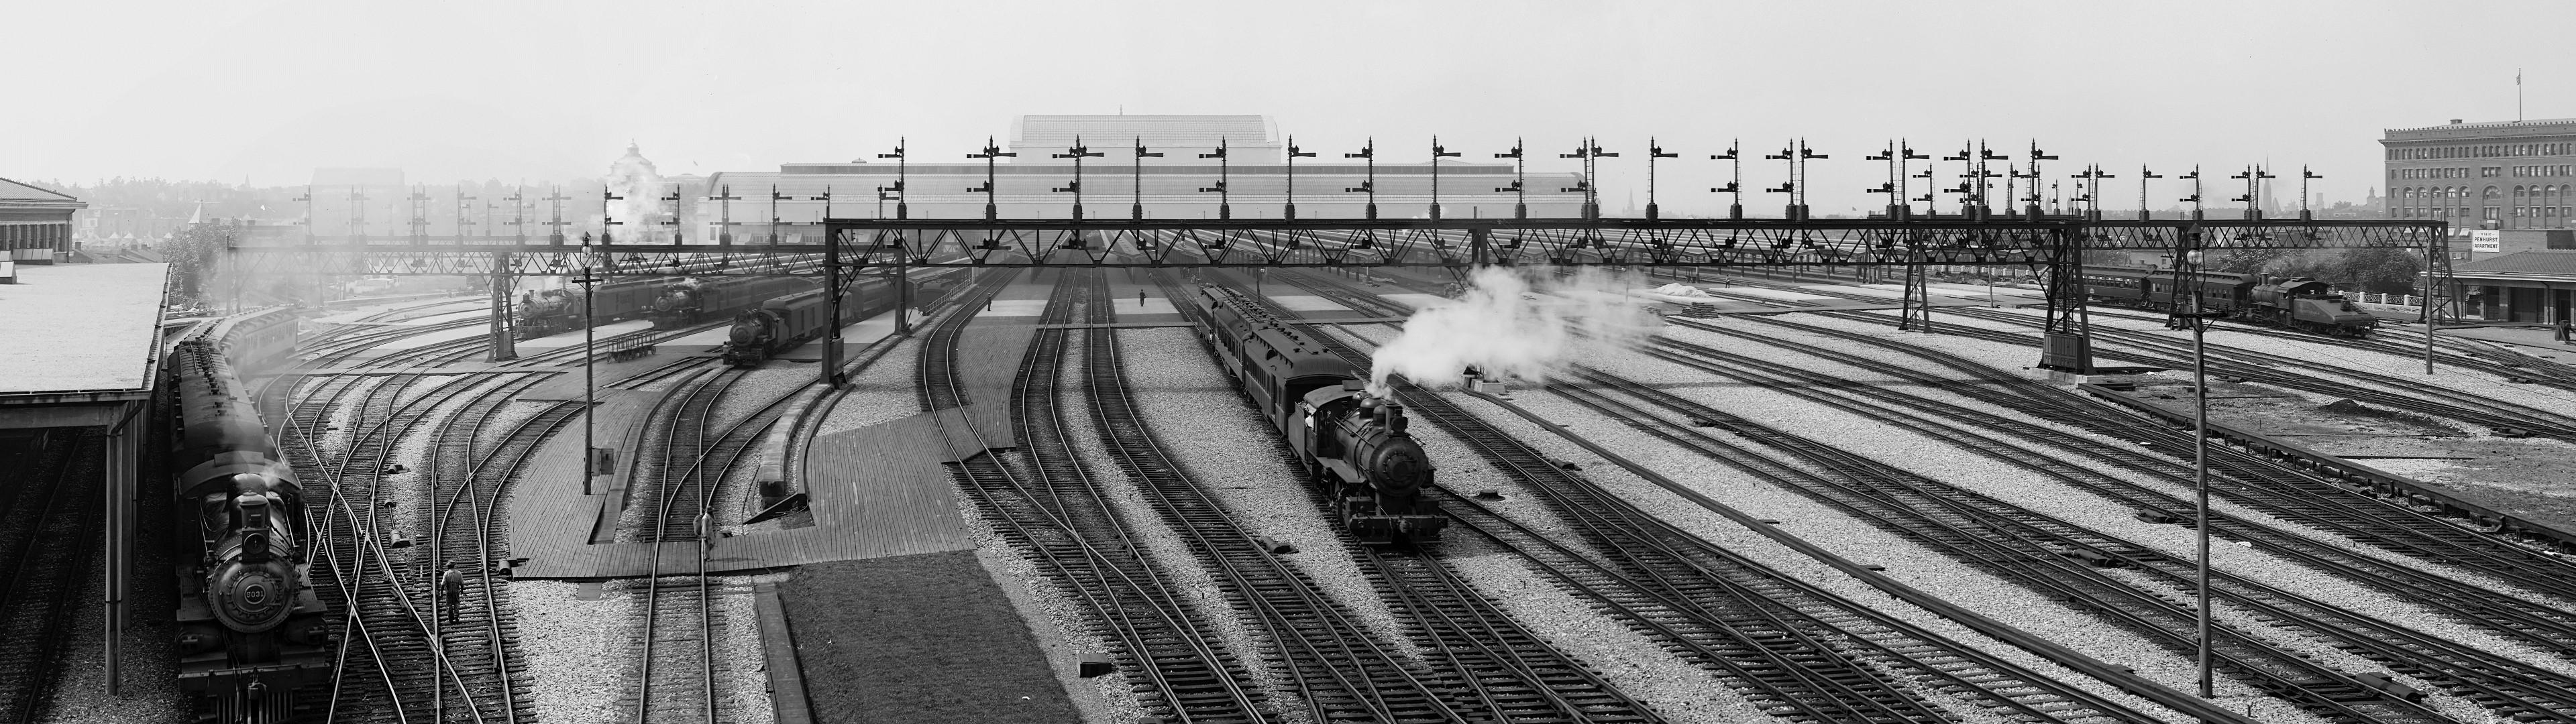 General 3840x1080 train monochrome steam locomotive rail yard railway multiple display